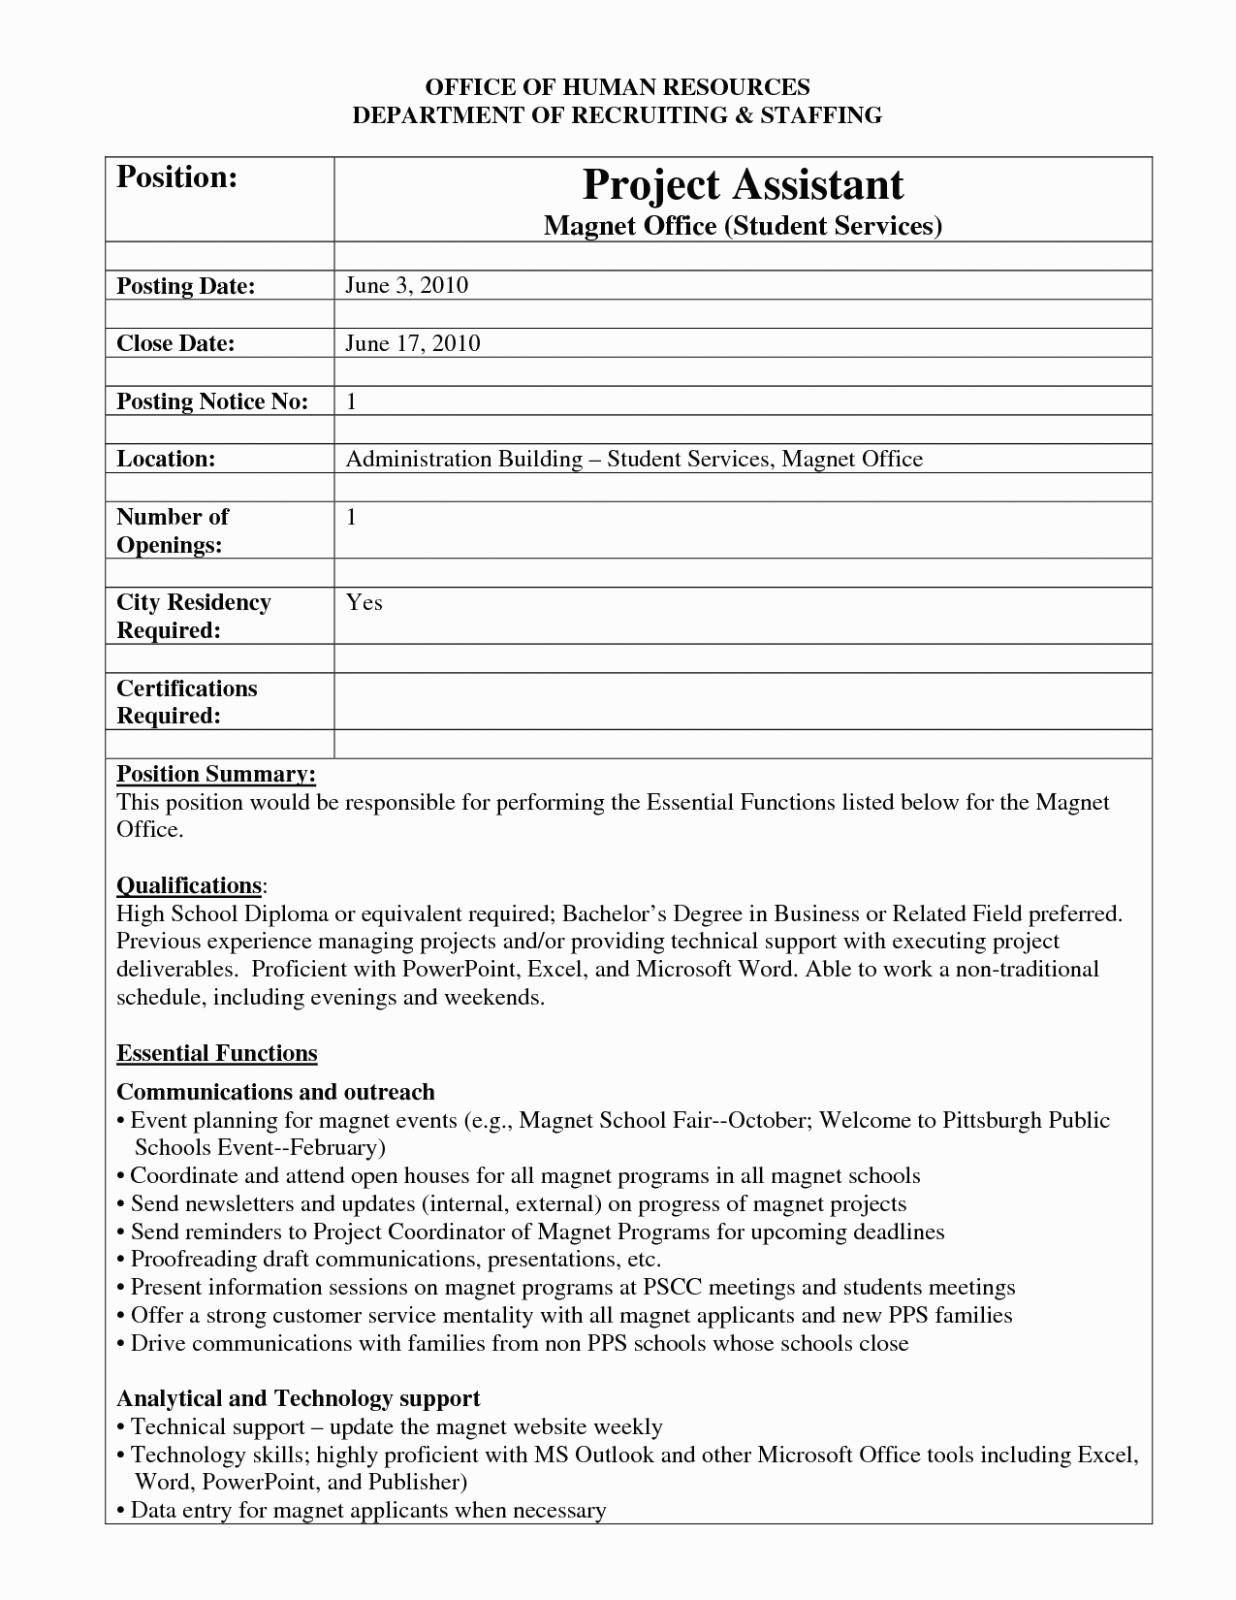 Internal Job Posting Template Word - Atlantaauctionco With Internal Job Posting Template Word